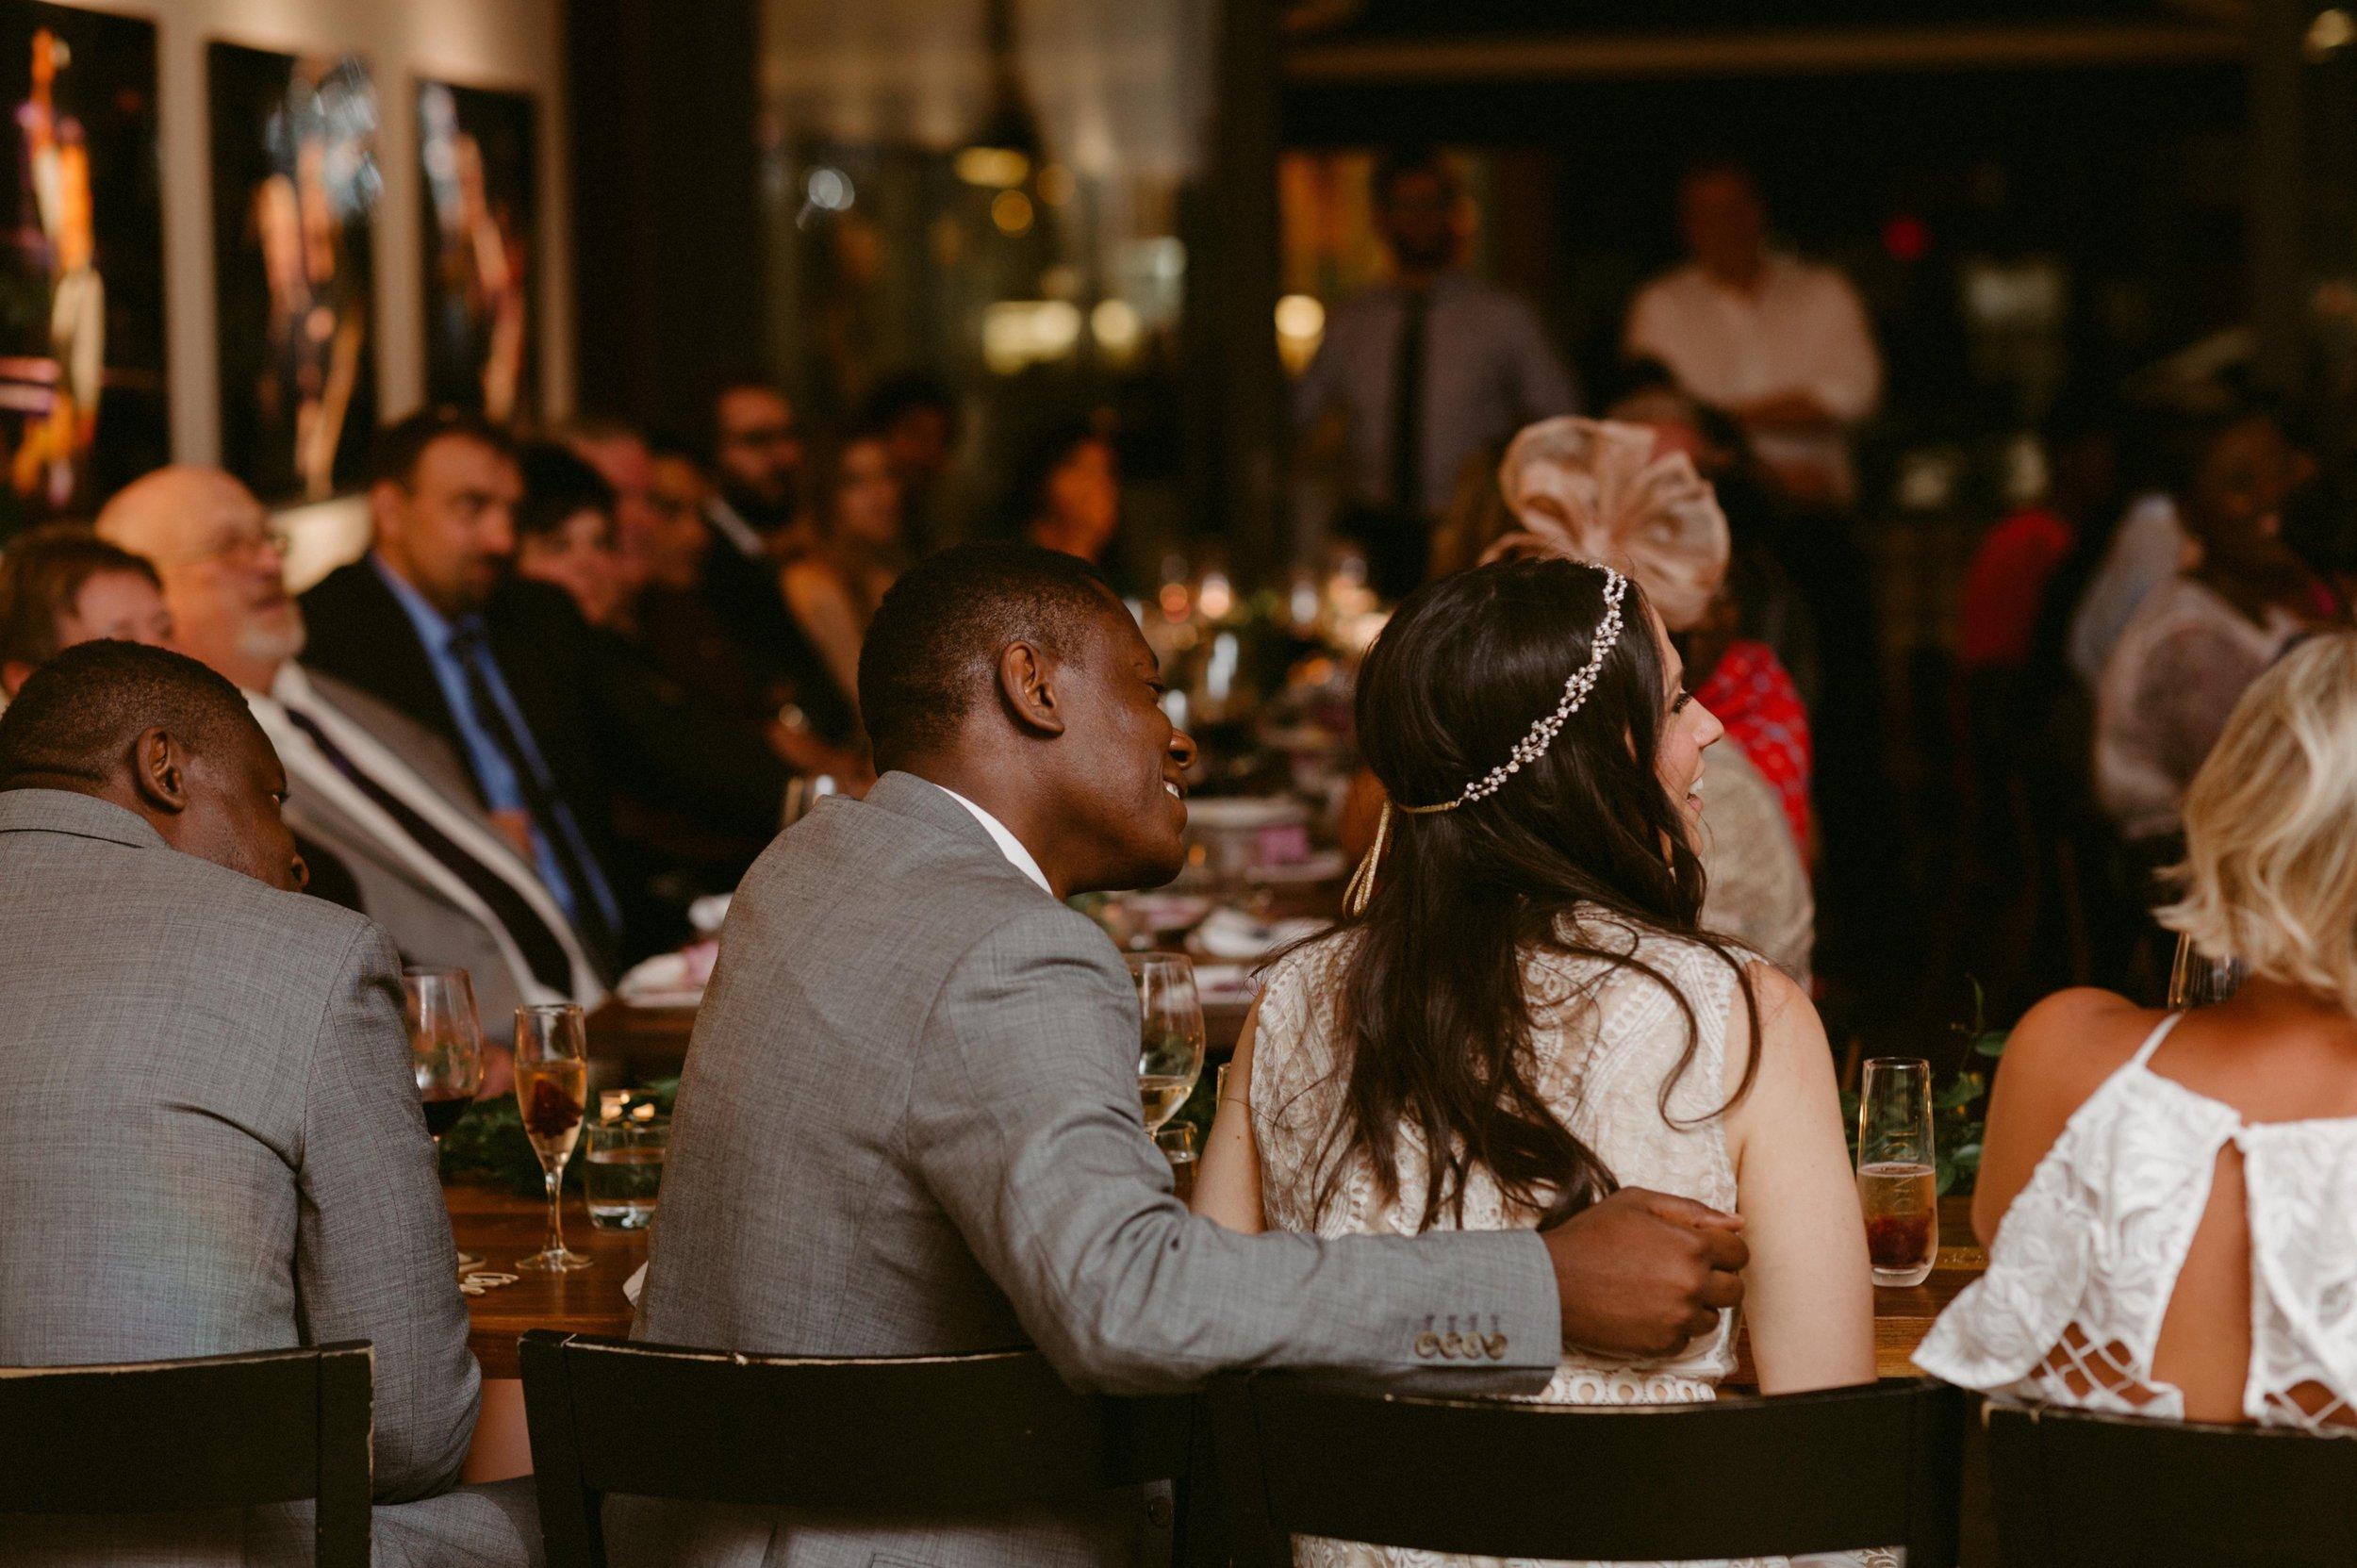 107_Spadina House Wedding (611 of 748)_intimate_Boehmer_Restaurant_Toronto_Wedding.jpg